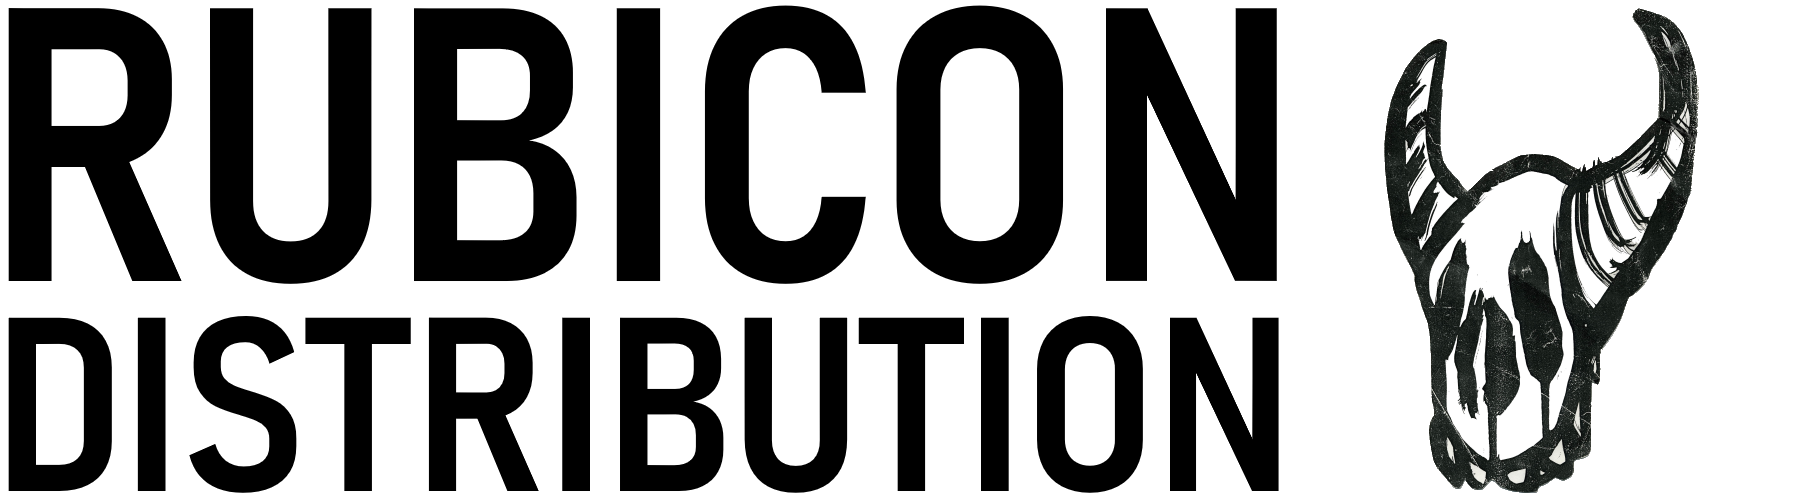 Rubicon Distribution